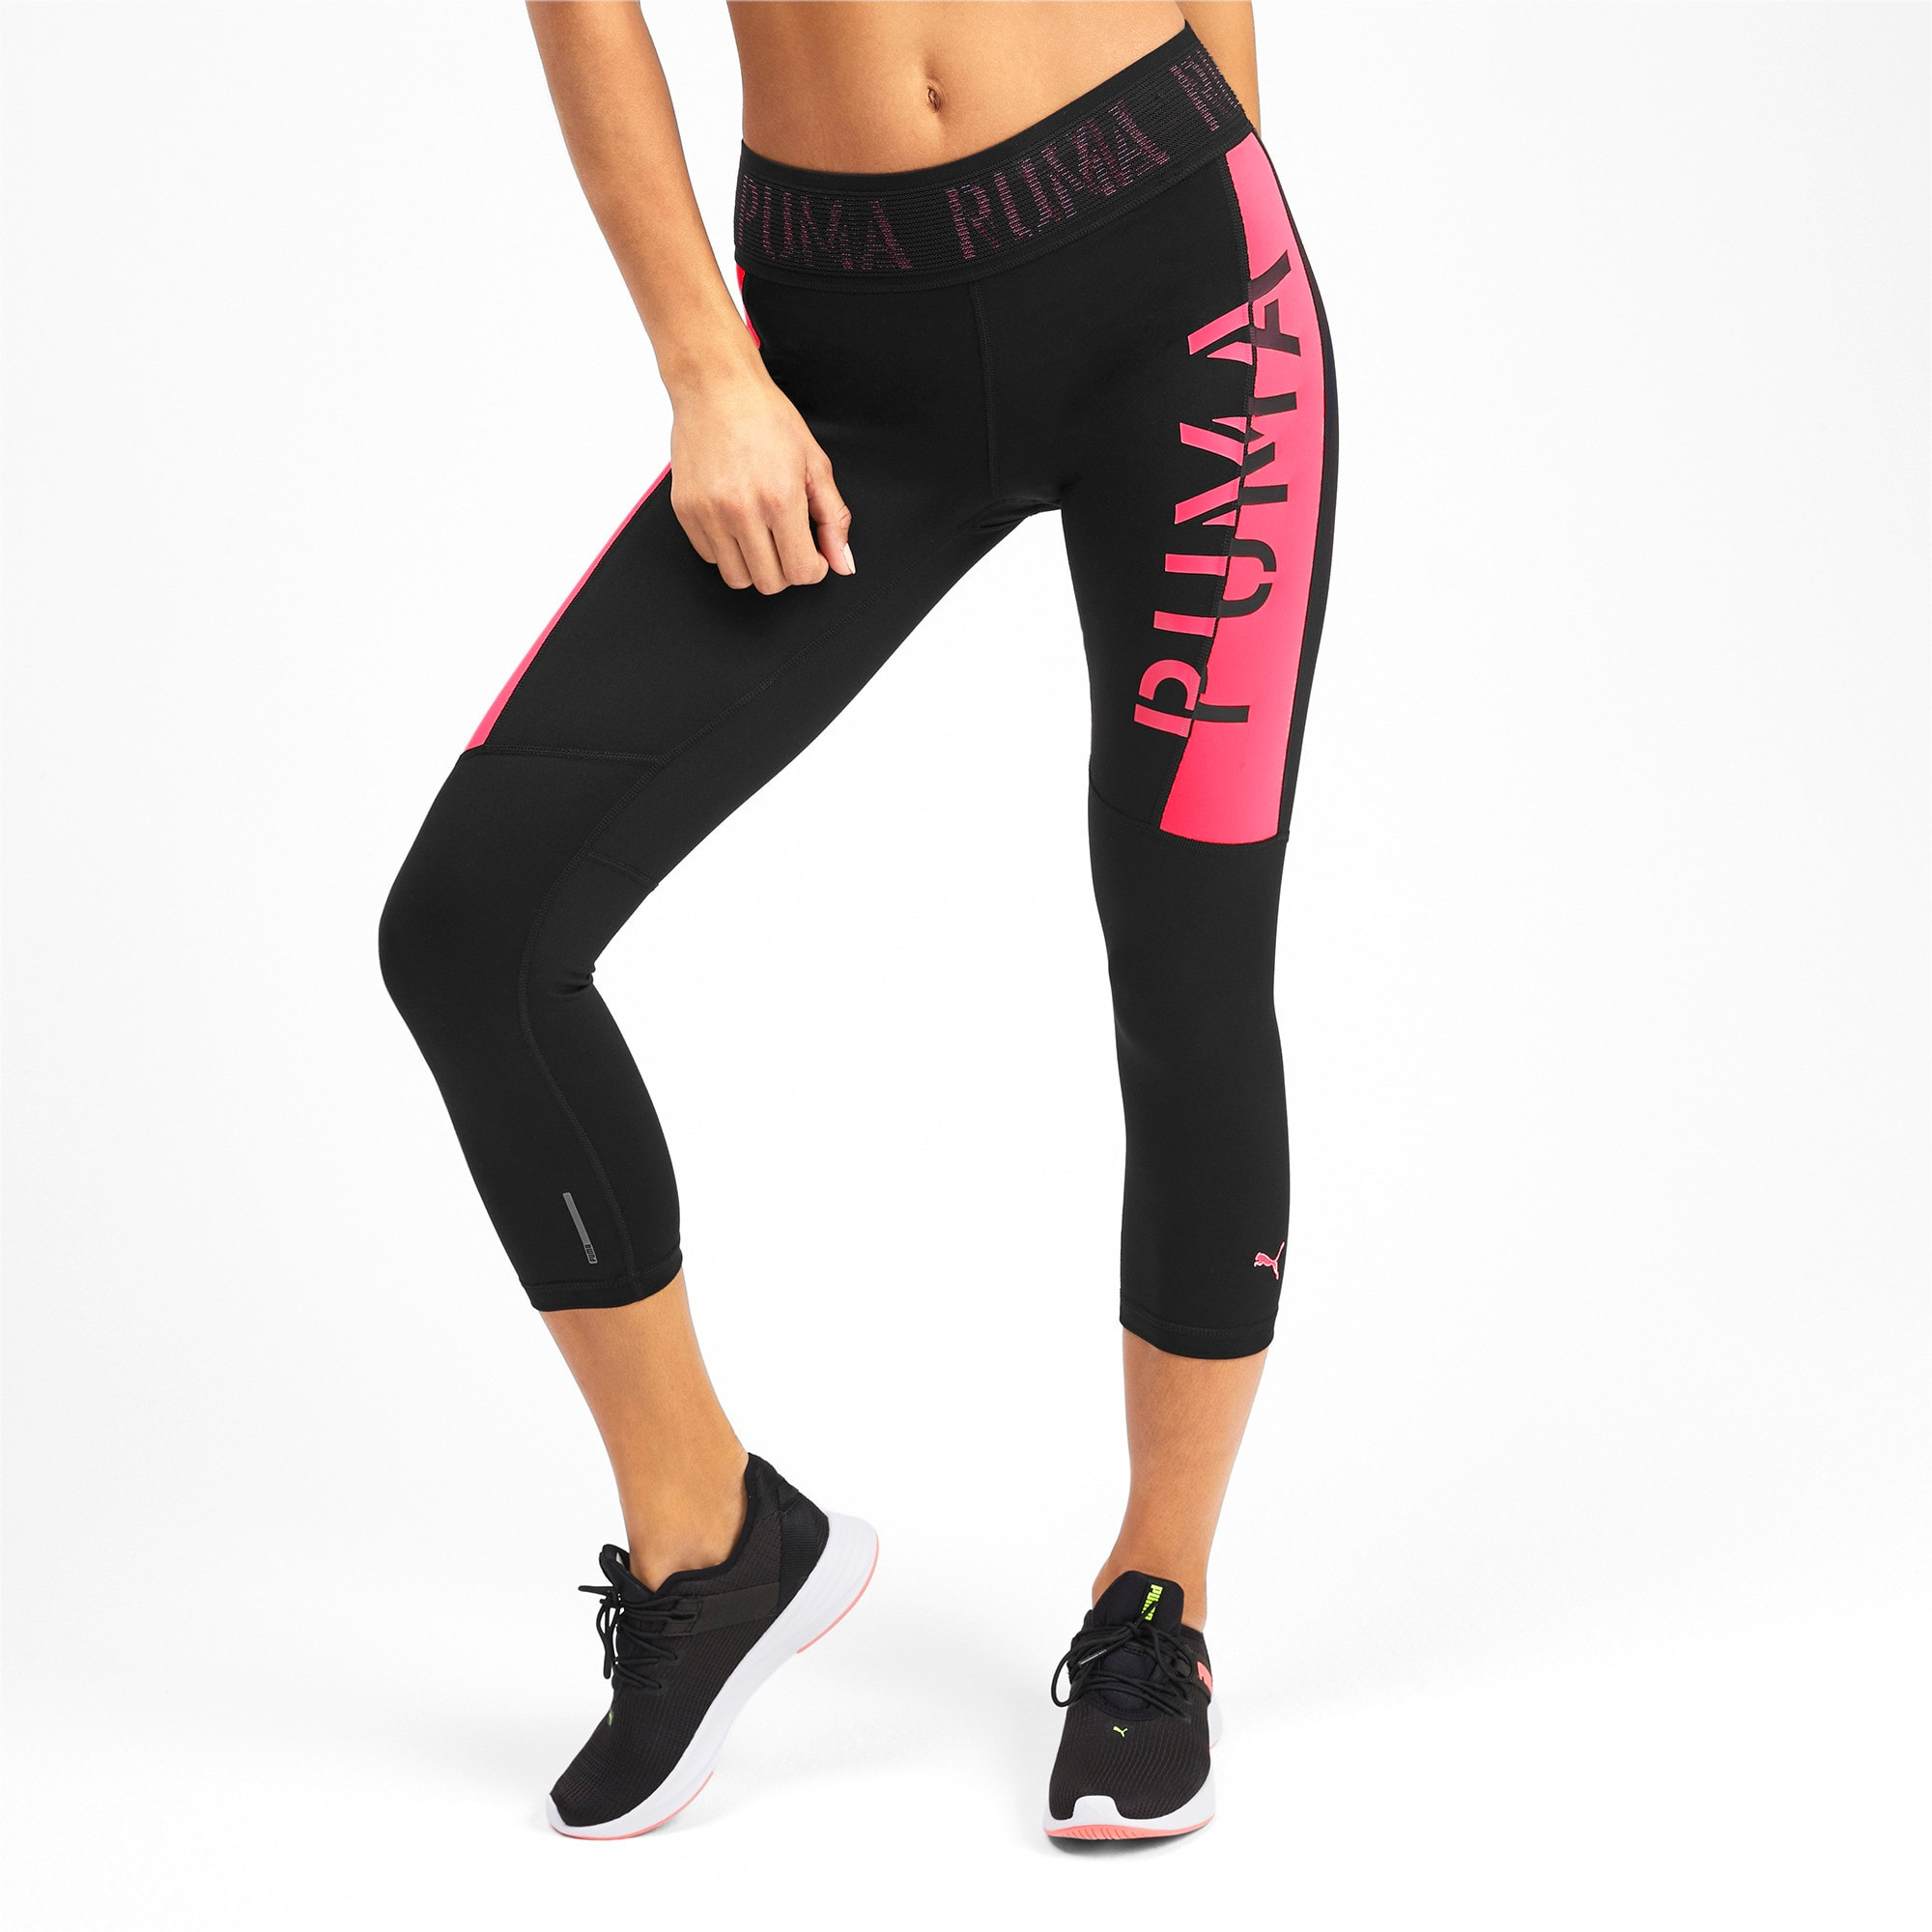 Thumbnail 2 of Logo Women's 3/4 Leggings, Puma Black-Pink Alert, medium